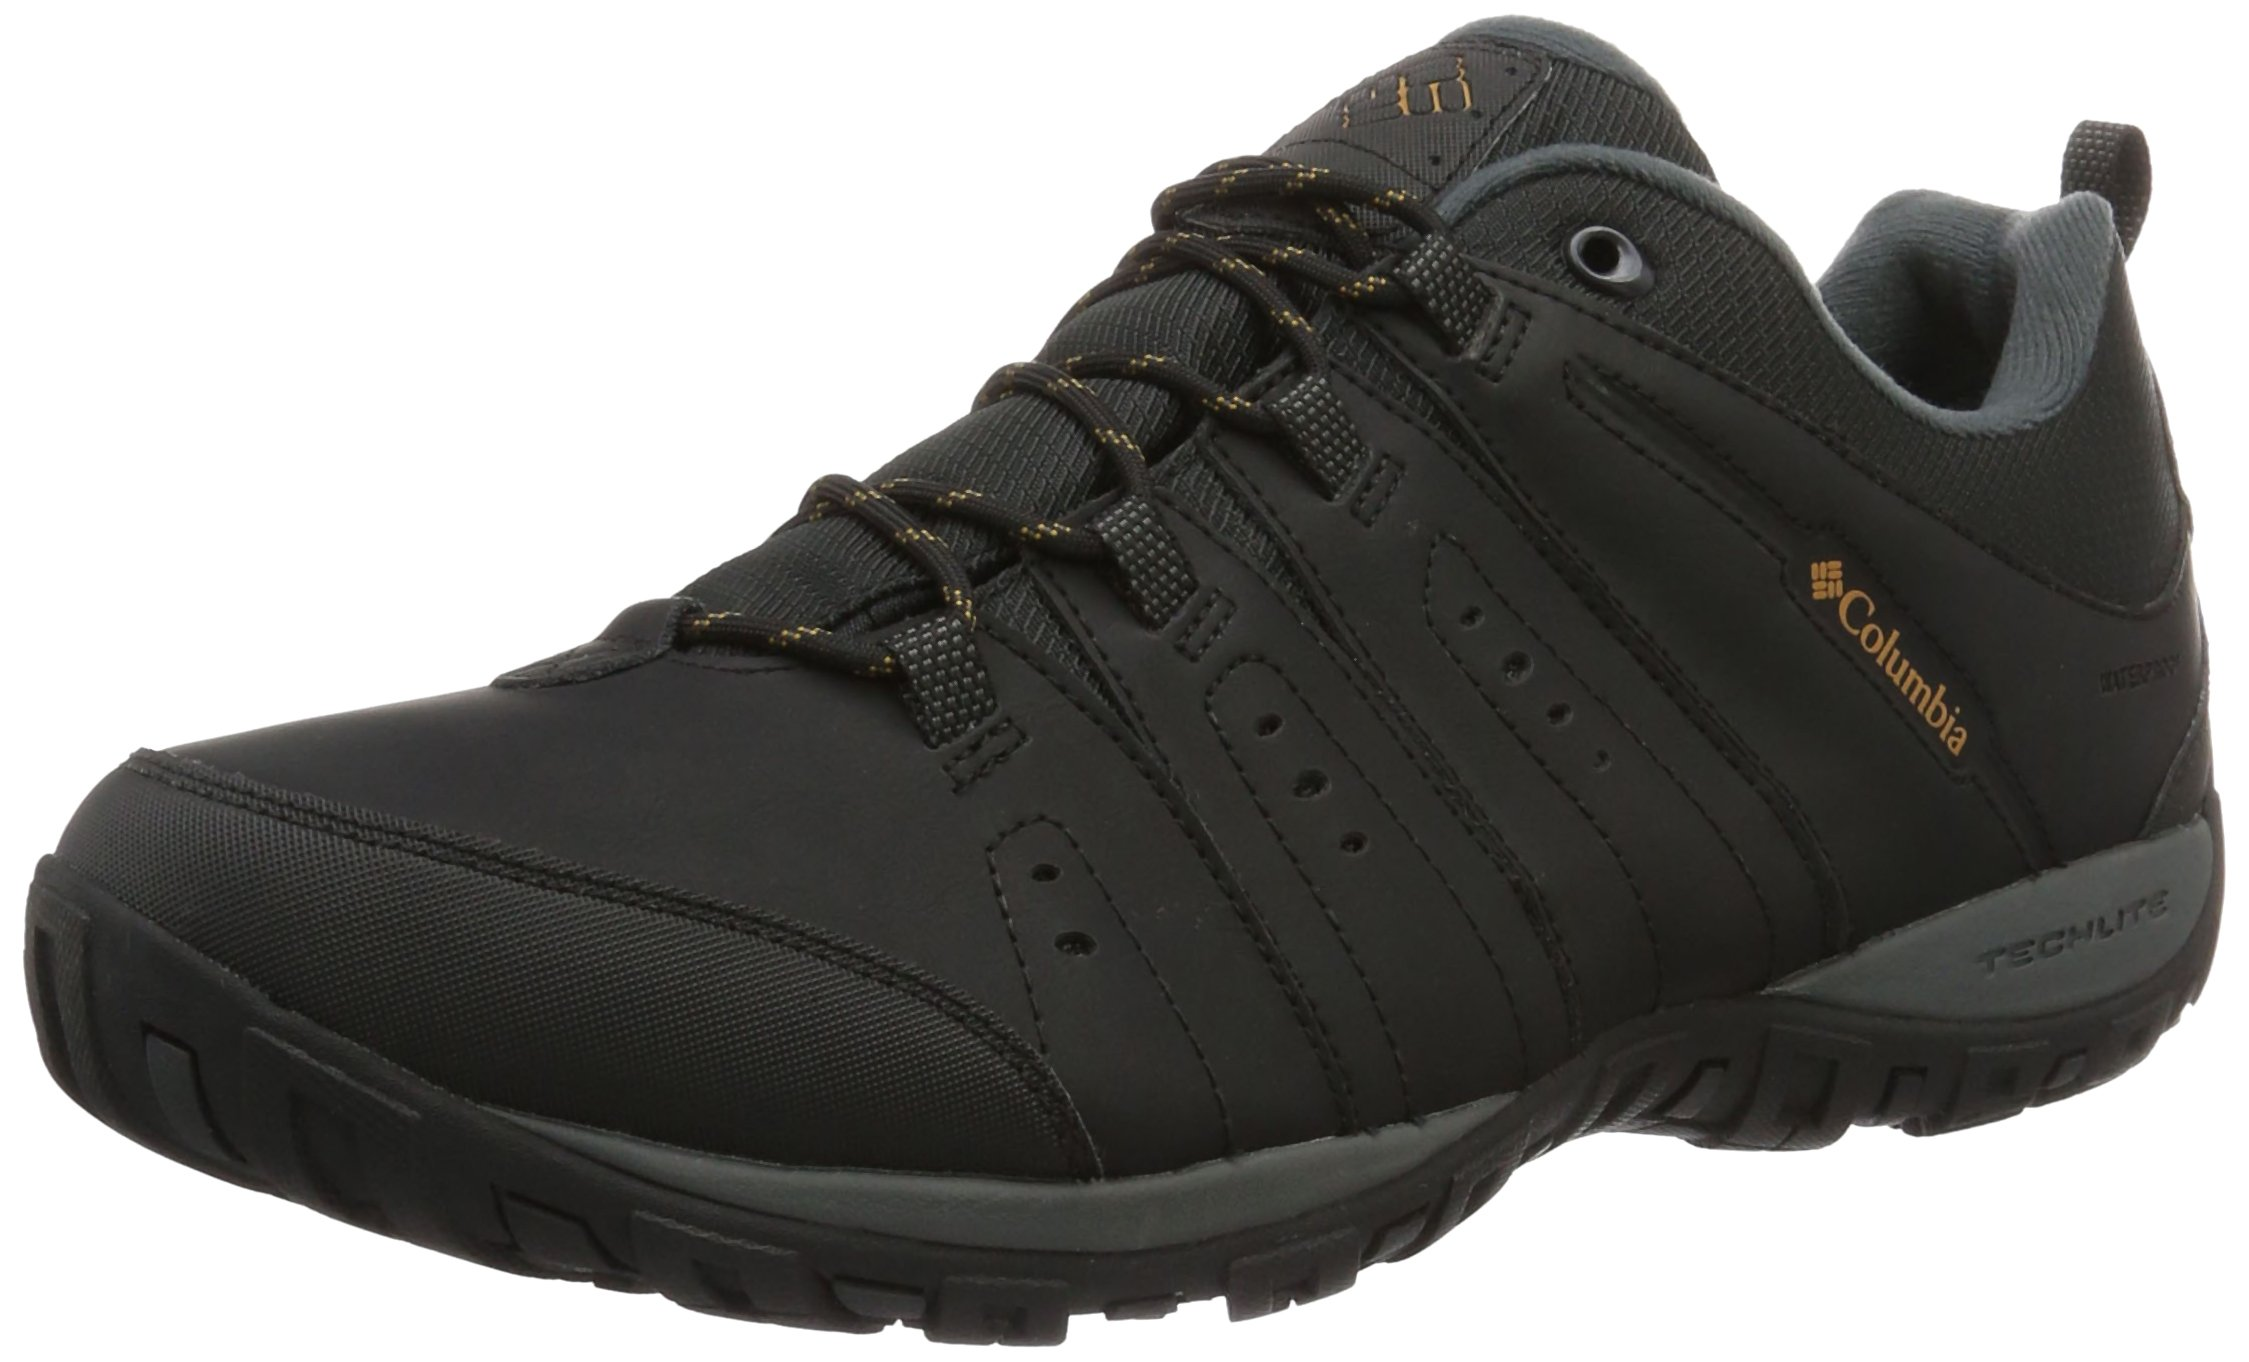 Woodburn II Waterproof, Chaussures de Randonnée Homme